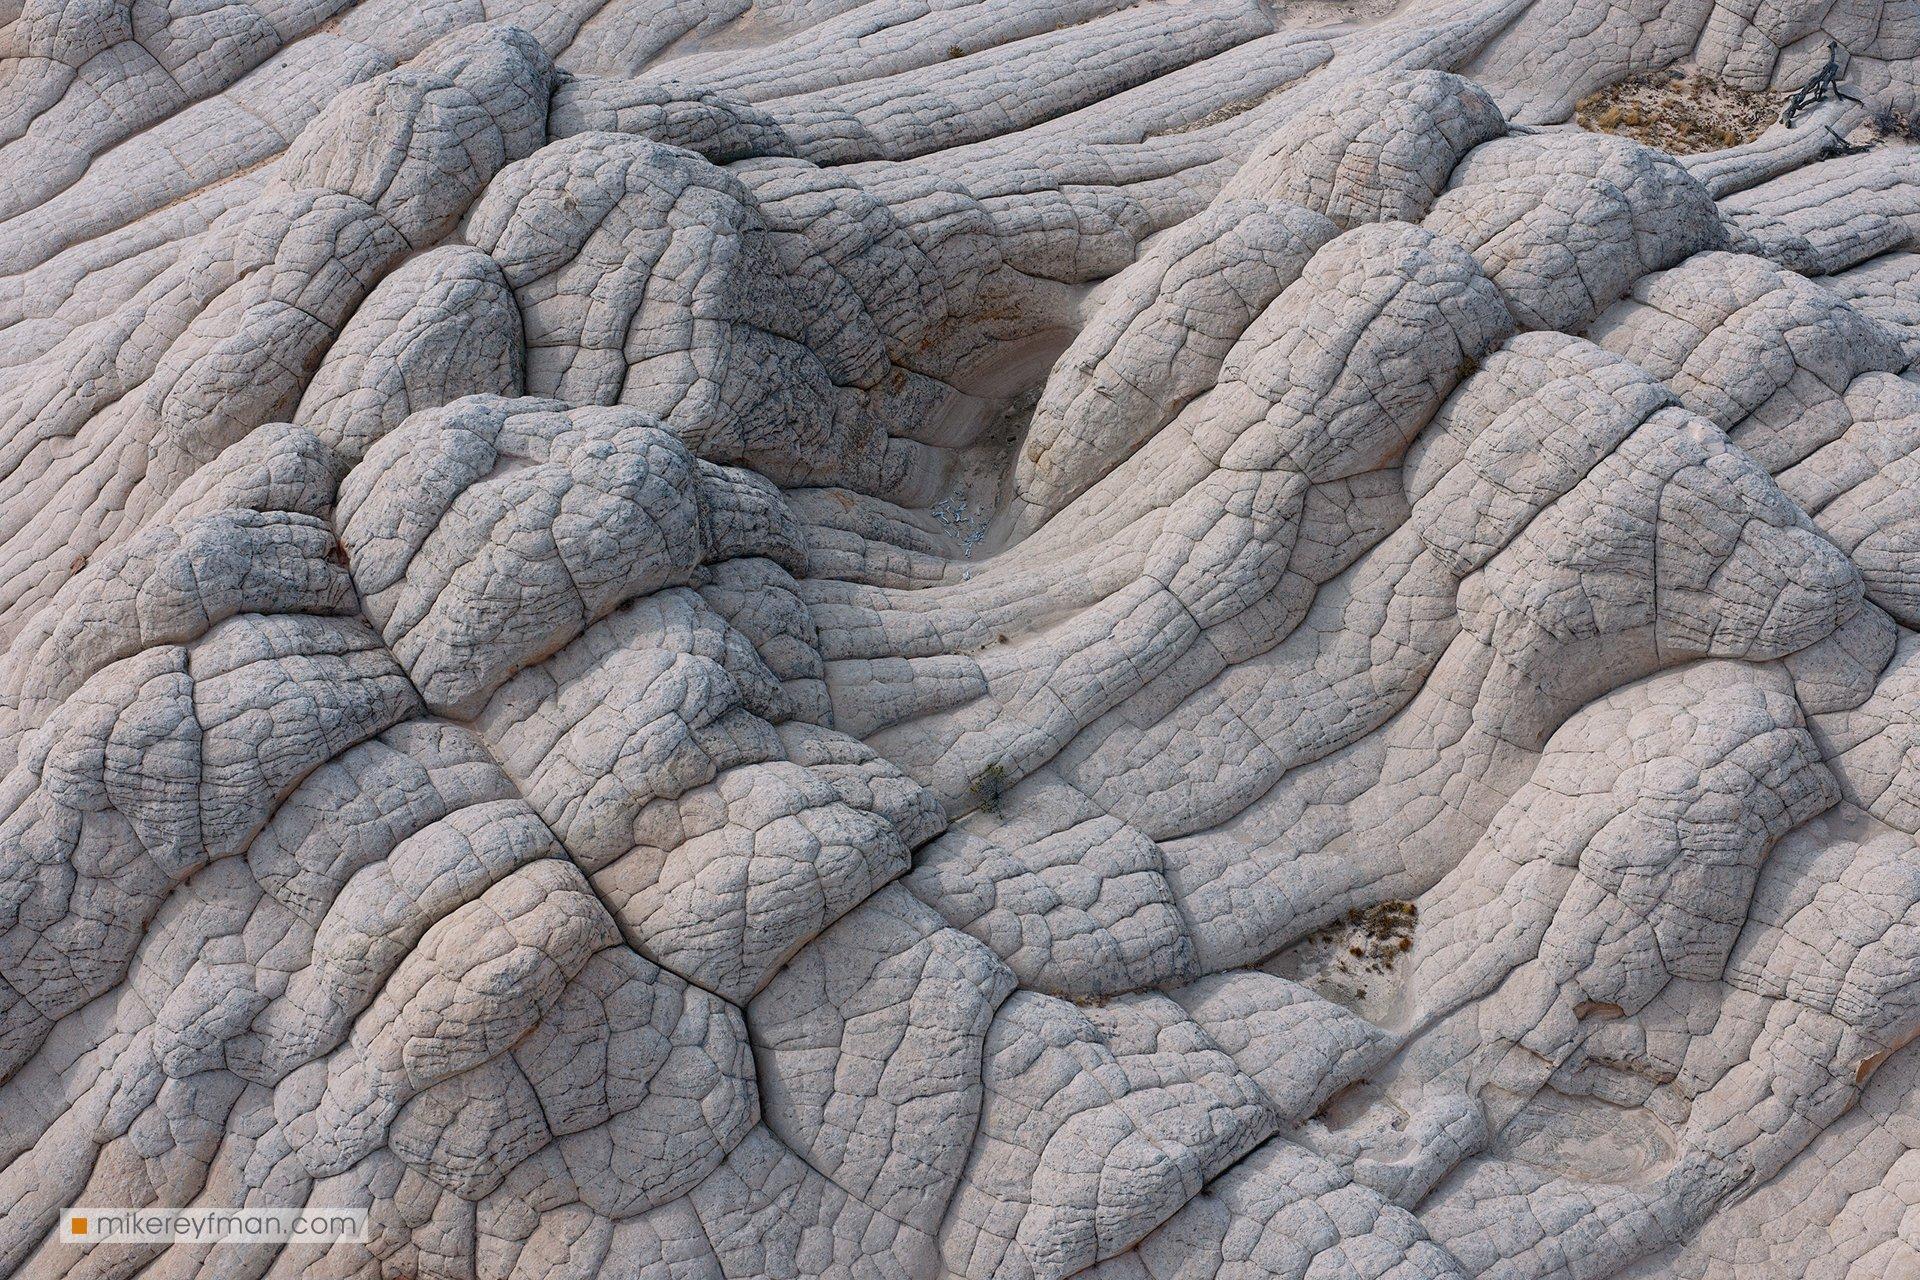 white pocket, arizona, texture, bones, unusual, spooky, us southwest, Майк Рейфман